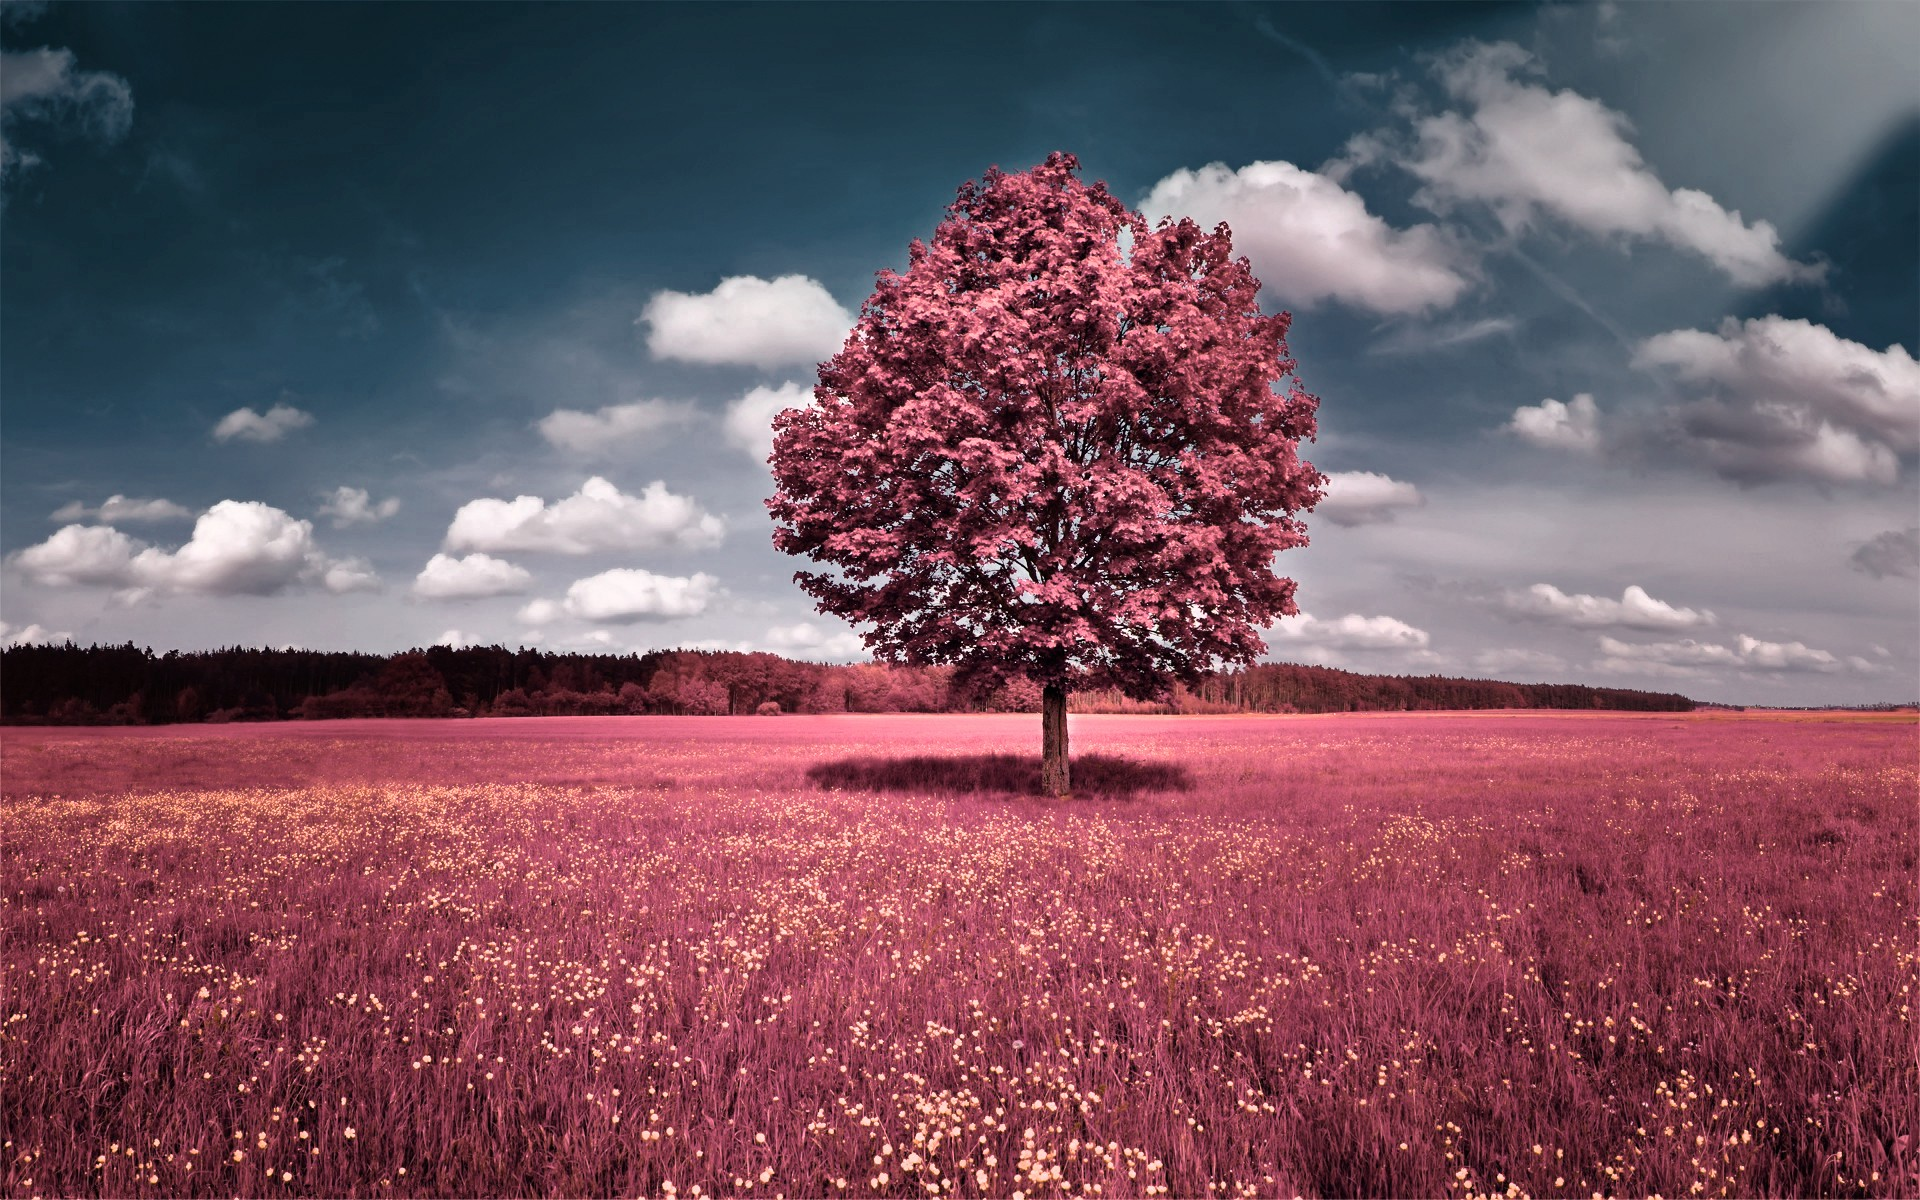 Pink Fantasy Nature Wallpaper.